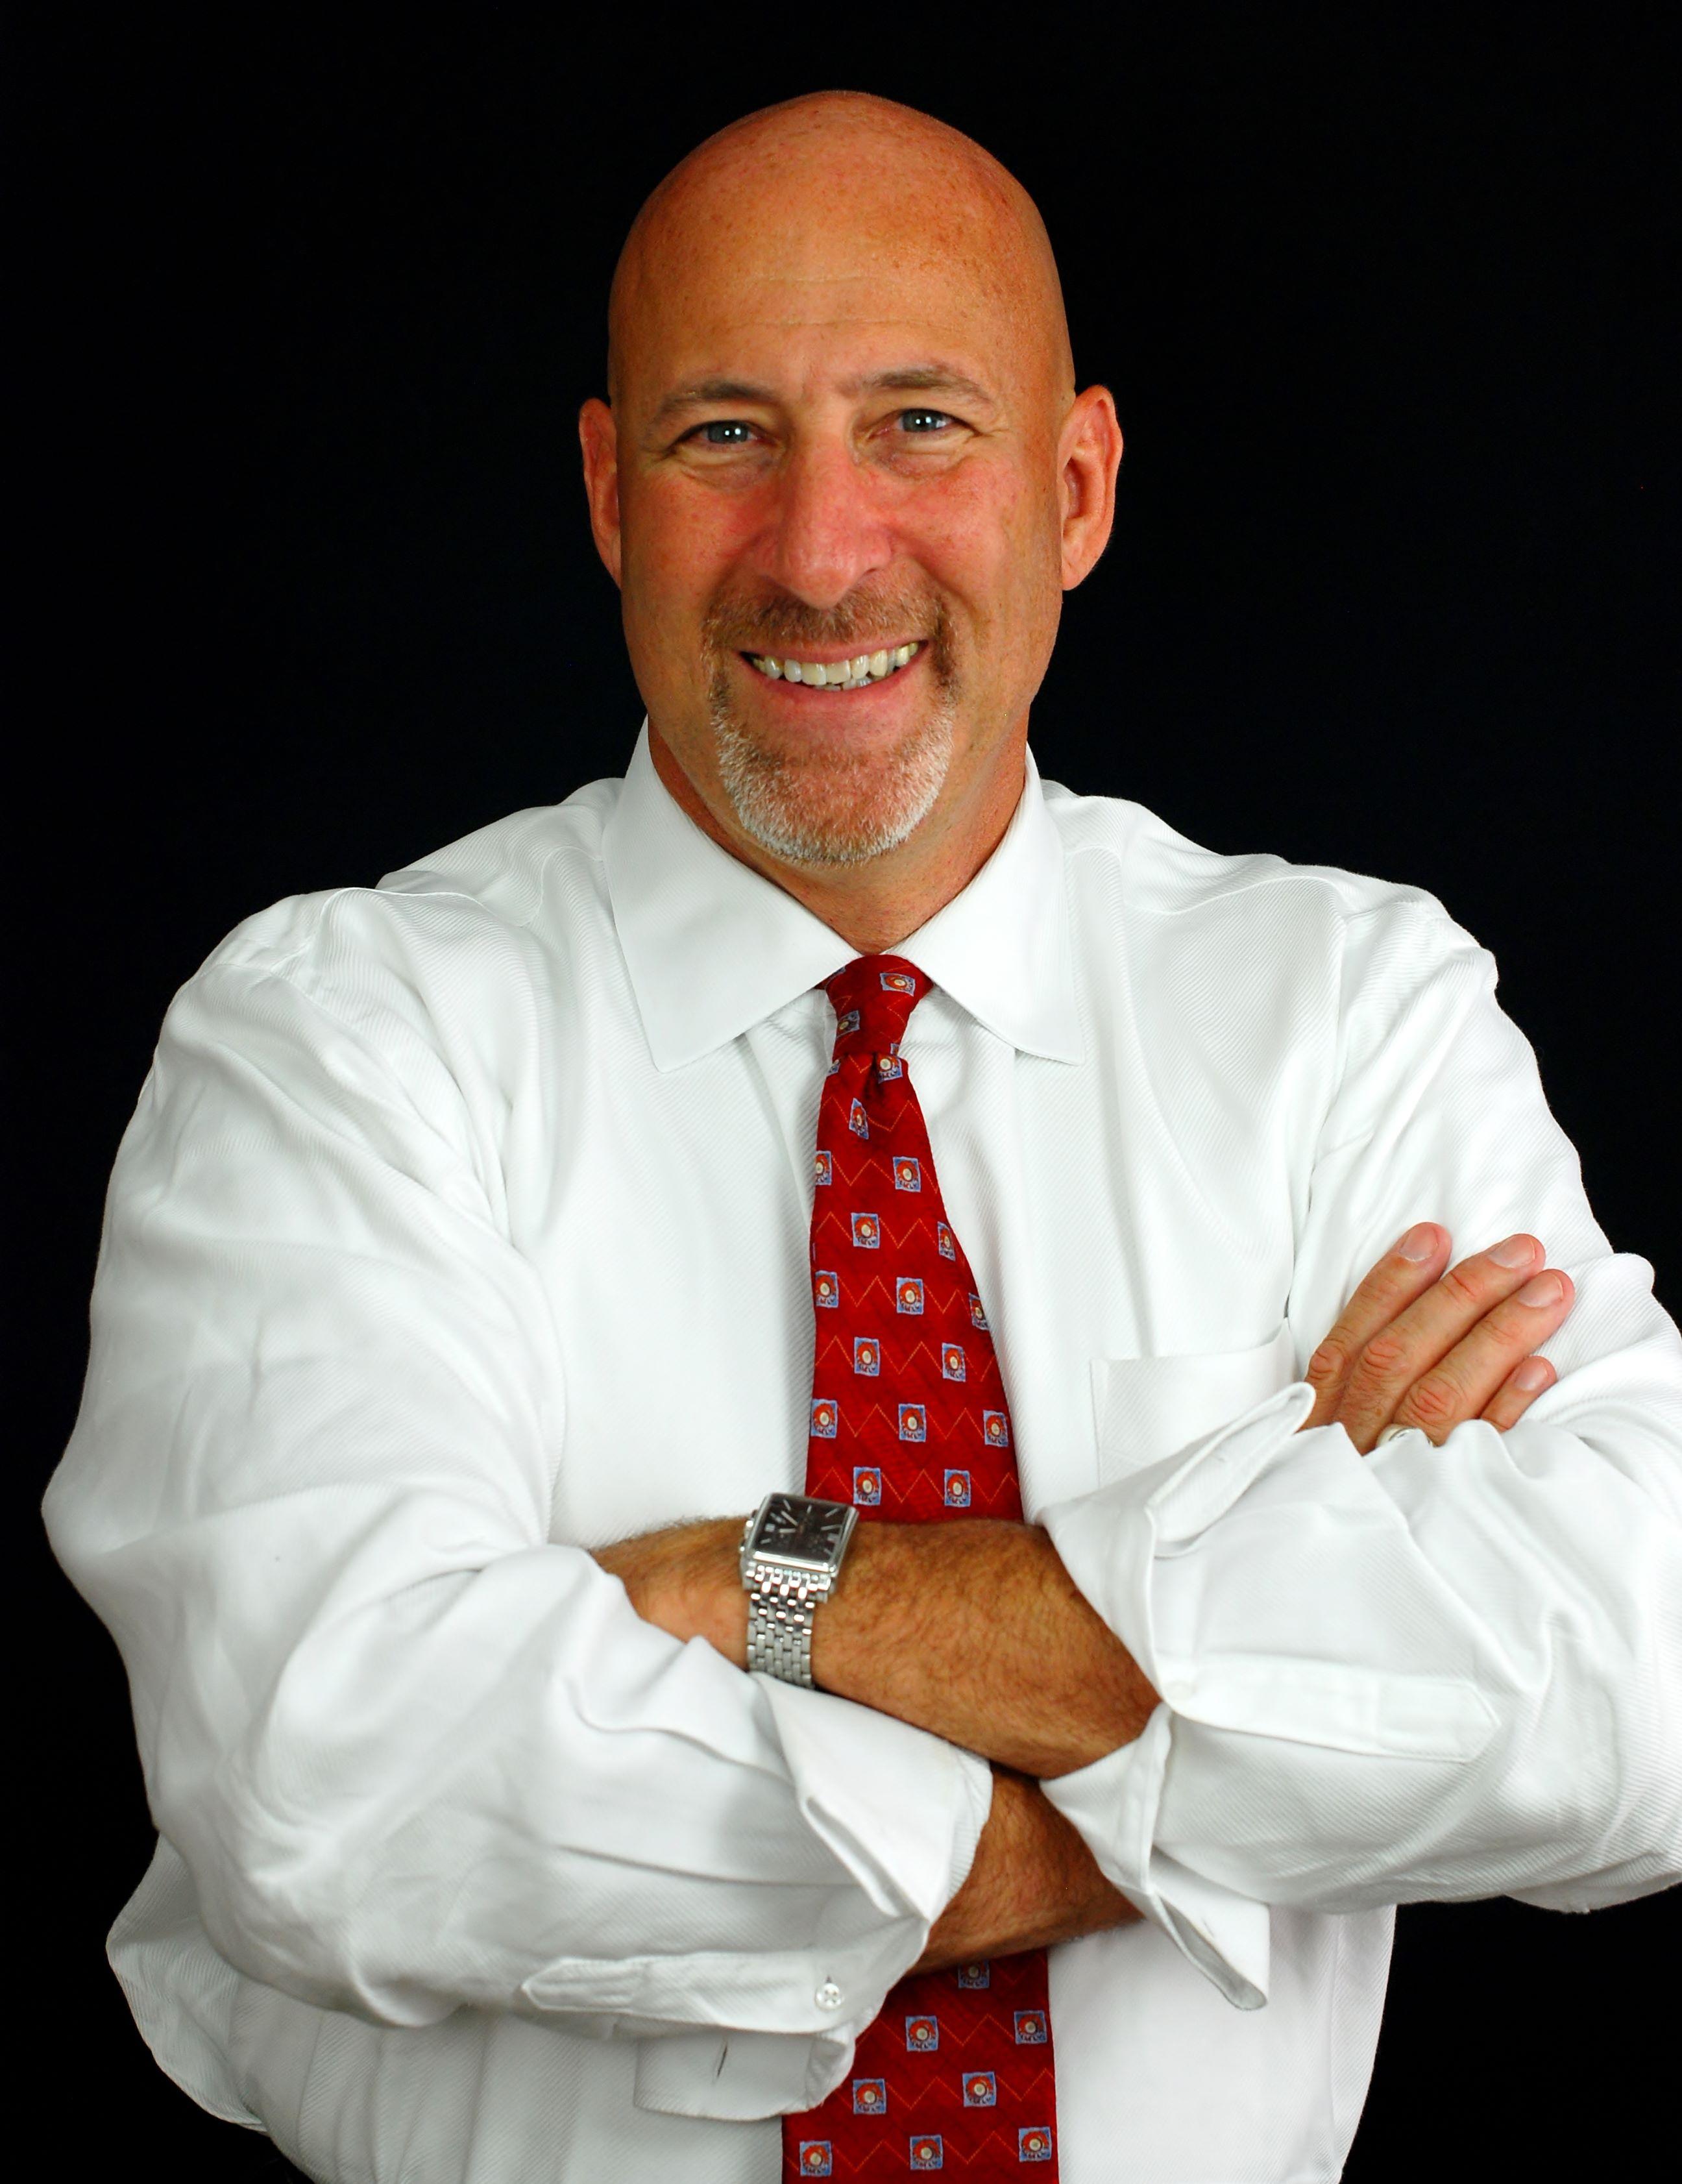 Rick Kolster